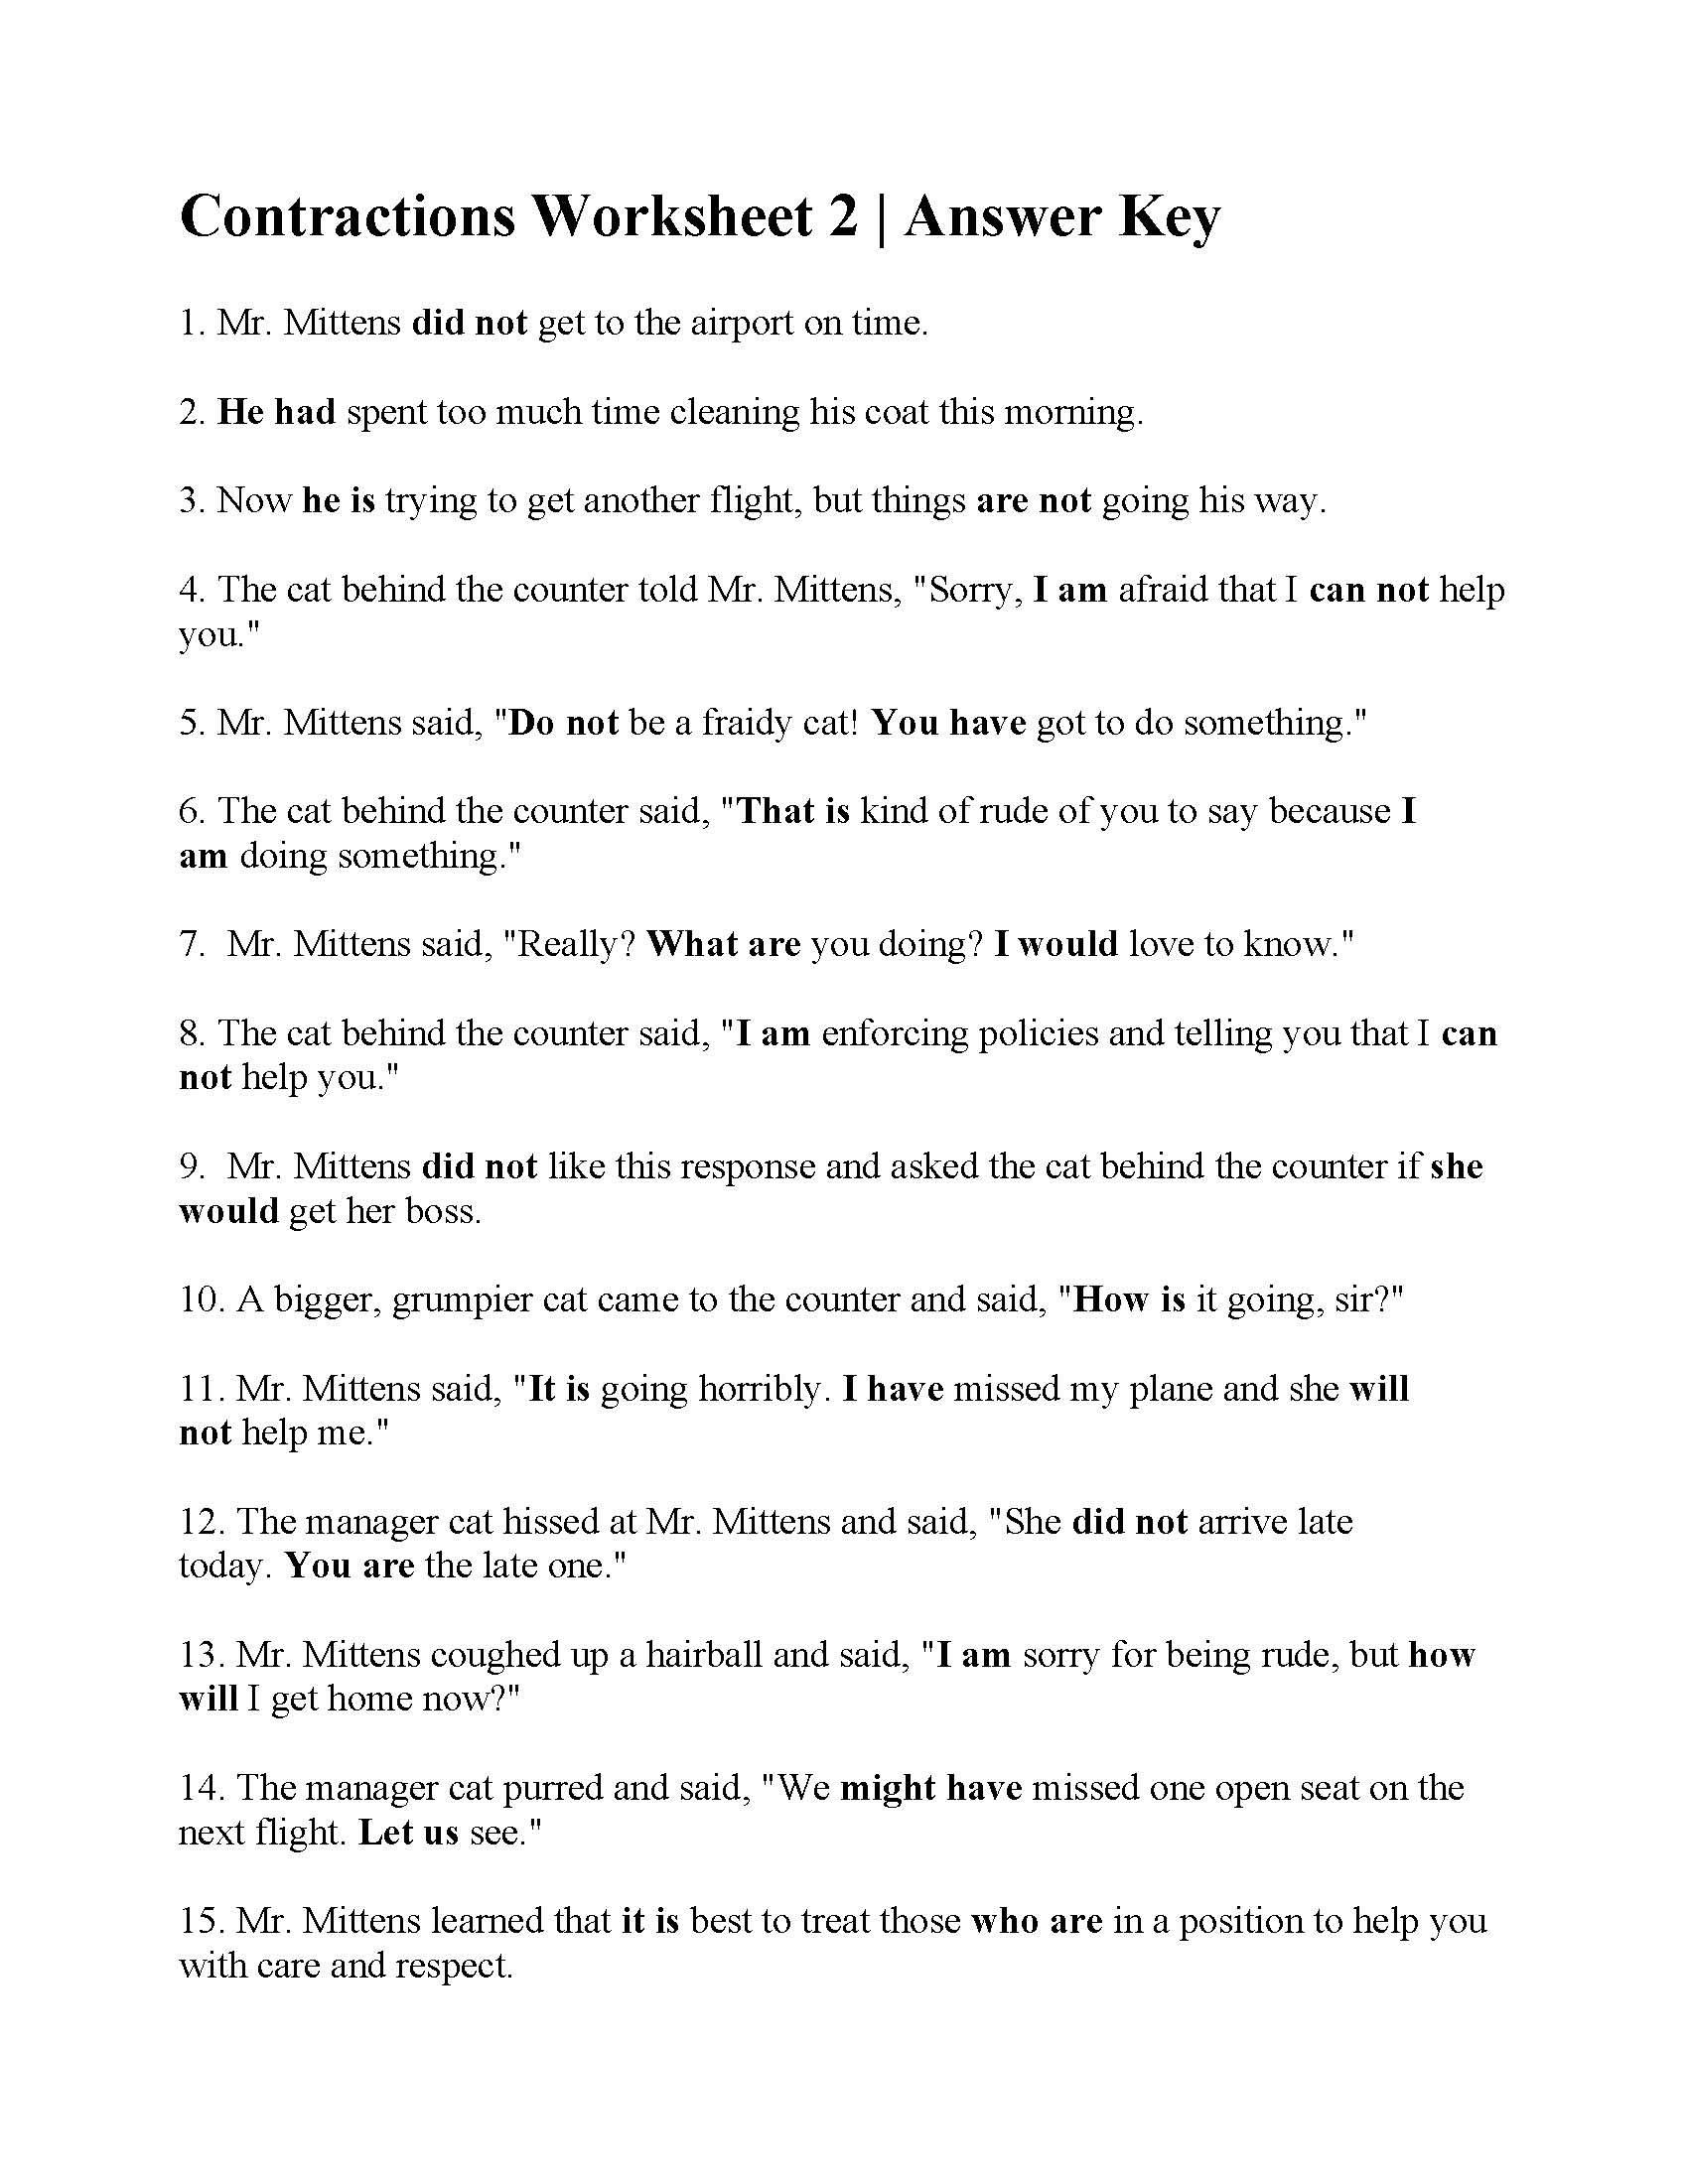 Contractions Worksheet 2nd Grade Contractions Worksheet 2